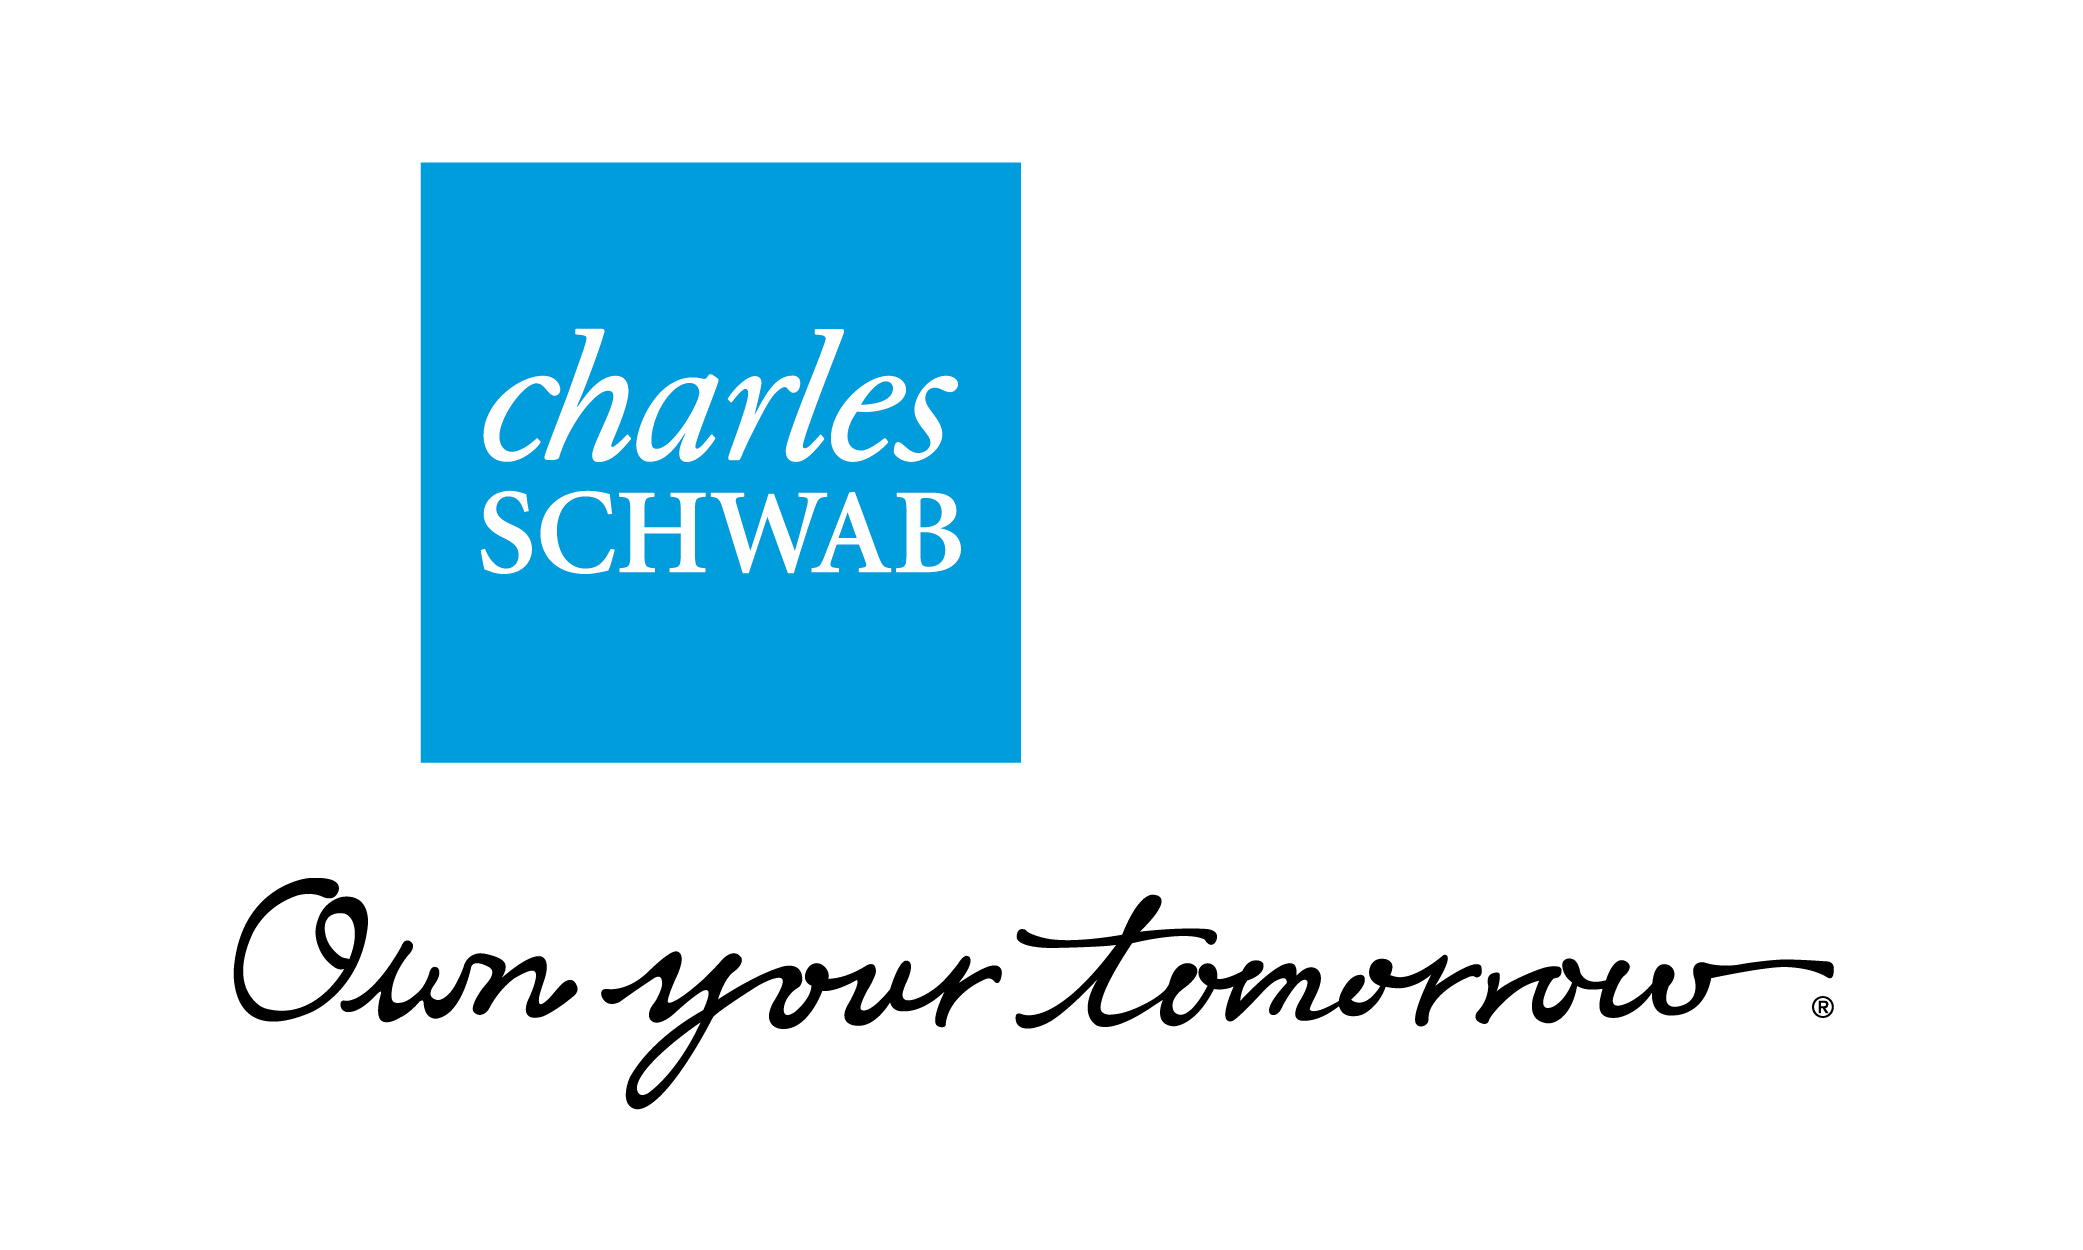 Schwab_AdvisorServices_WhitePaper-Logo-01_6_3.jpg